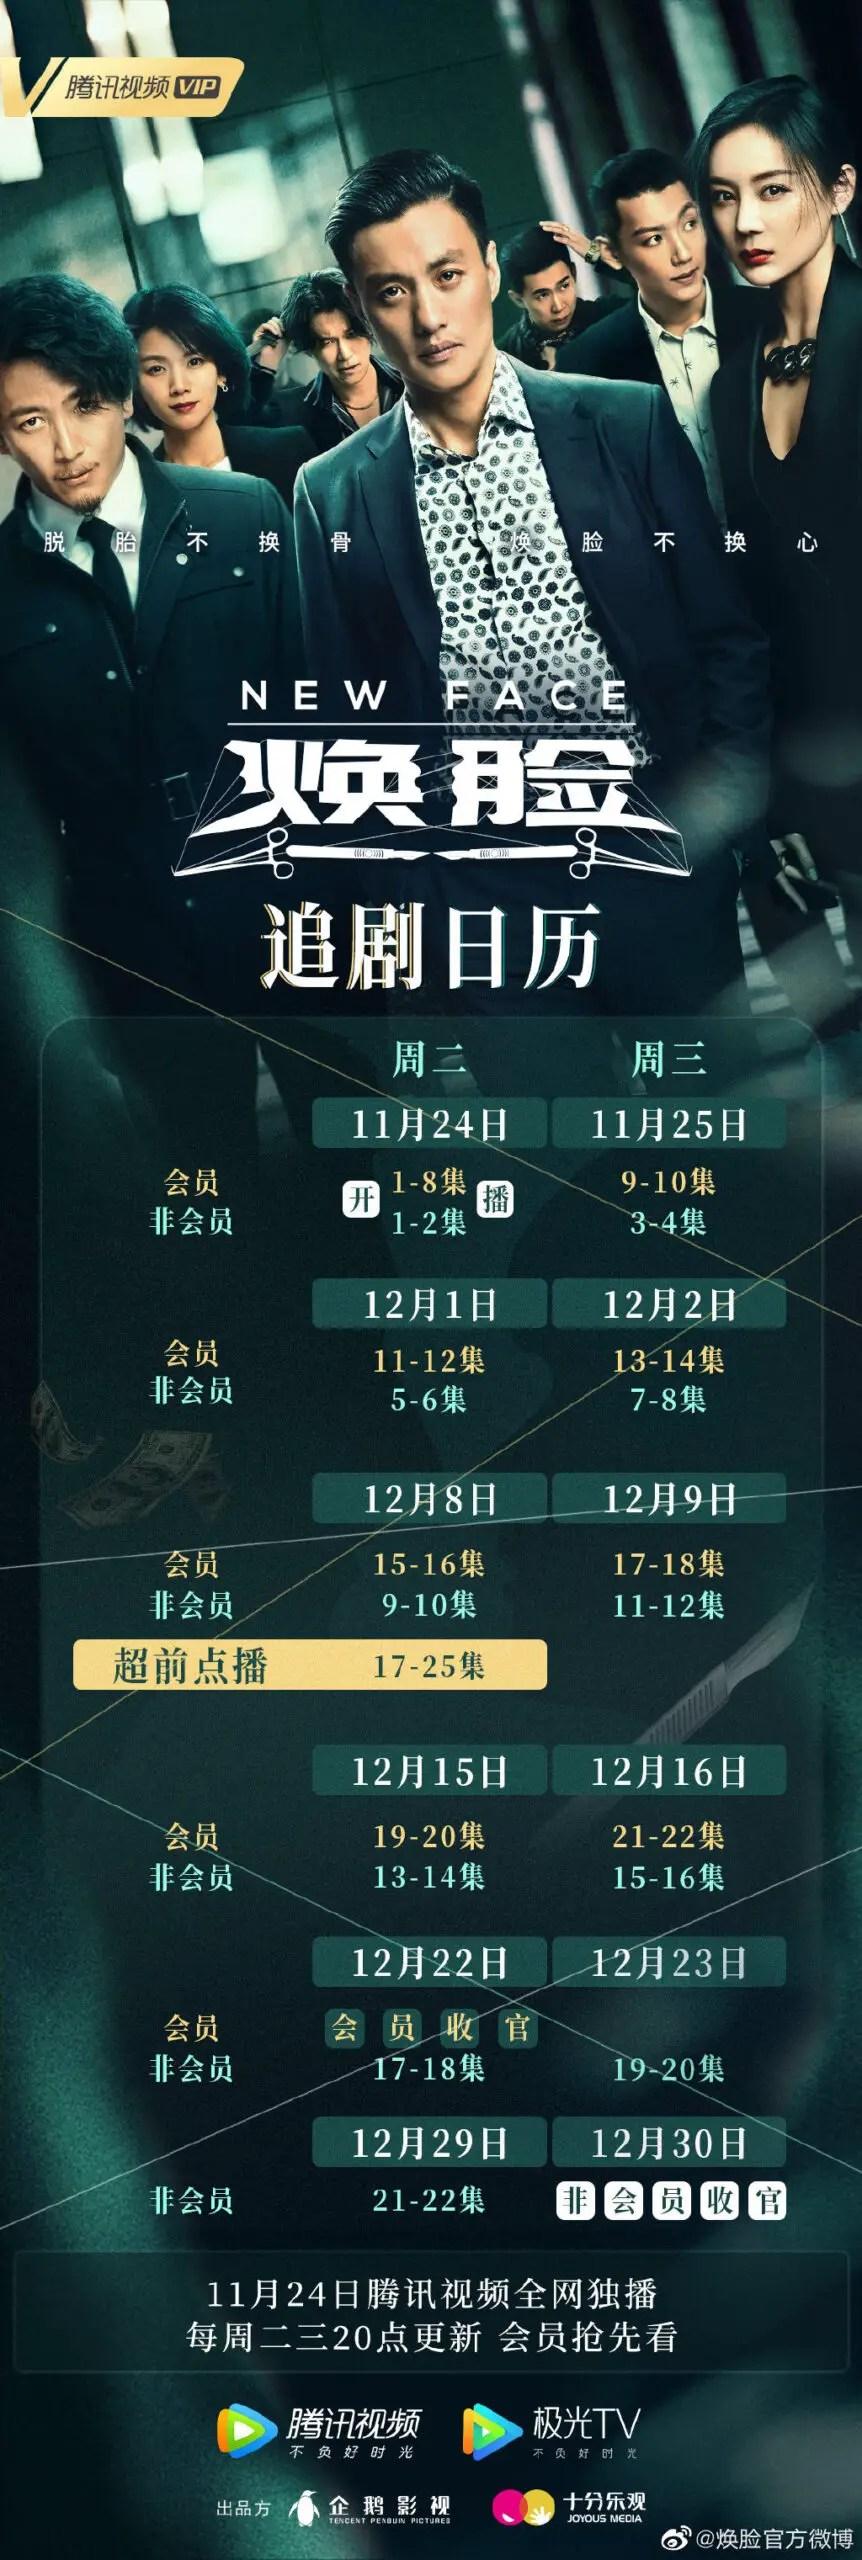 New Face Chinese Drama Airing Calendar